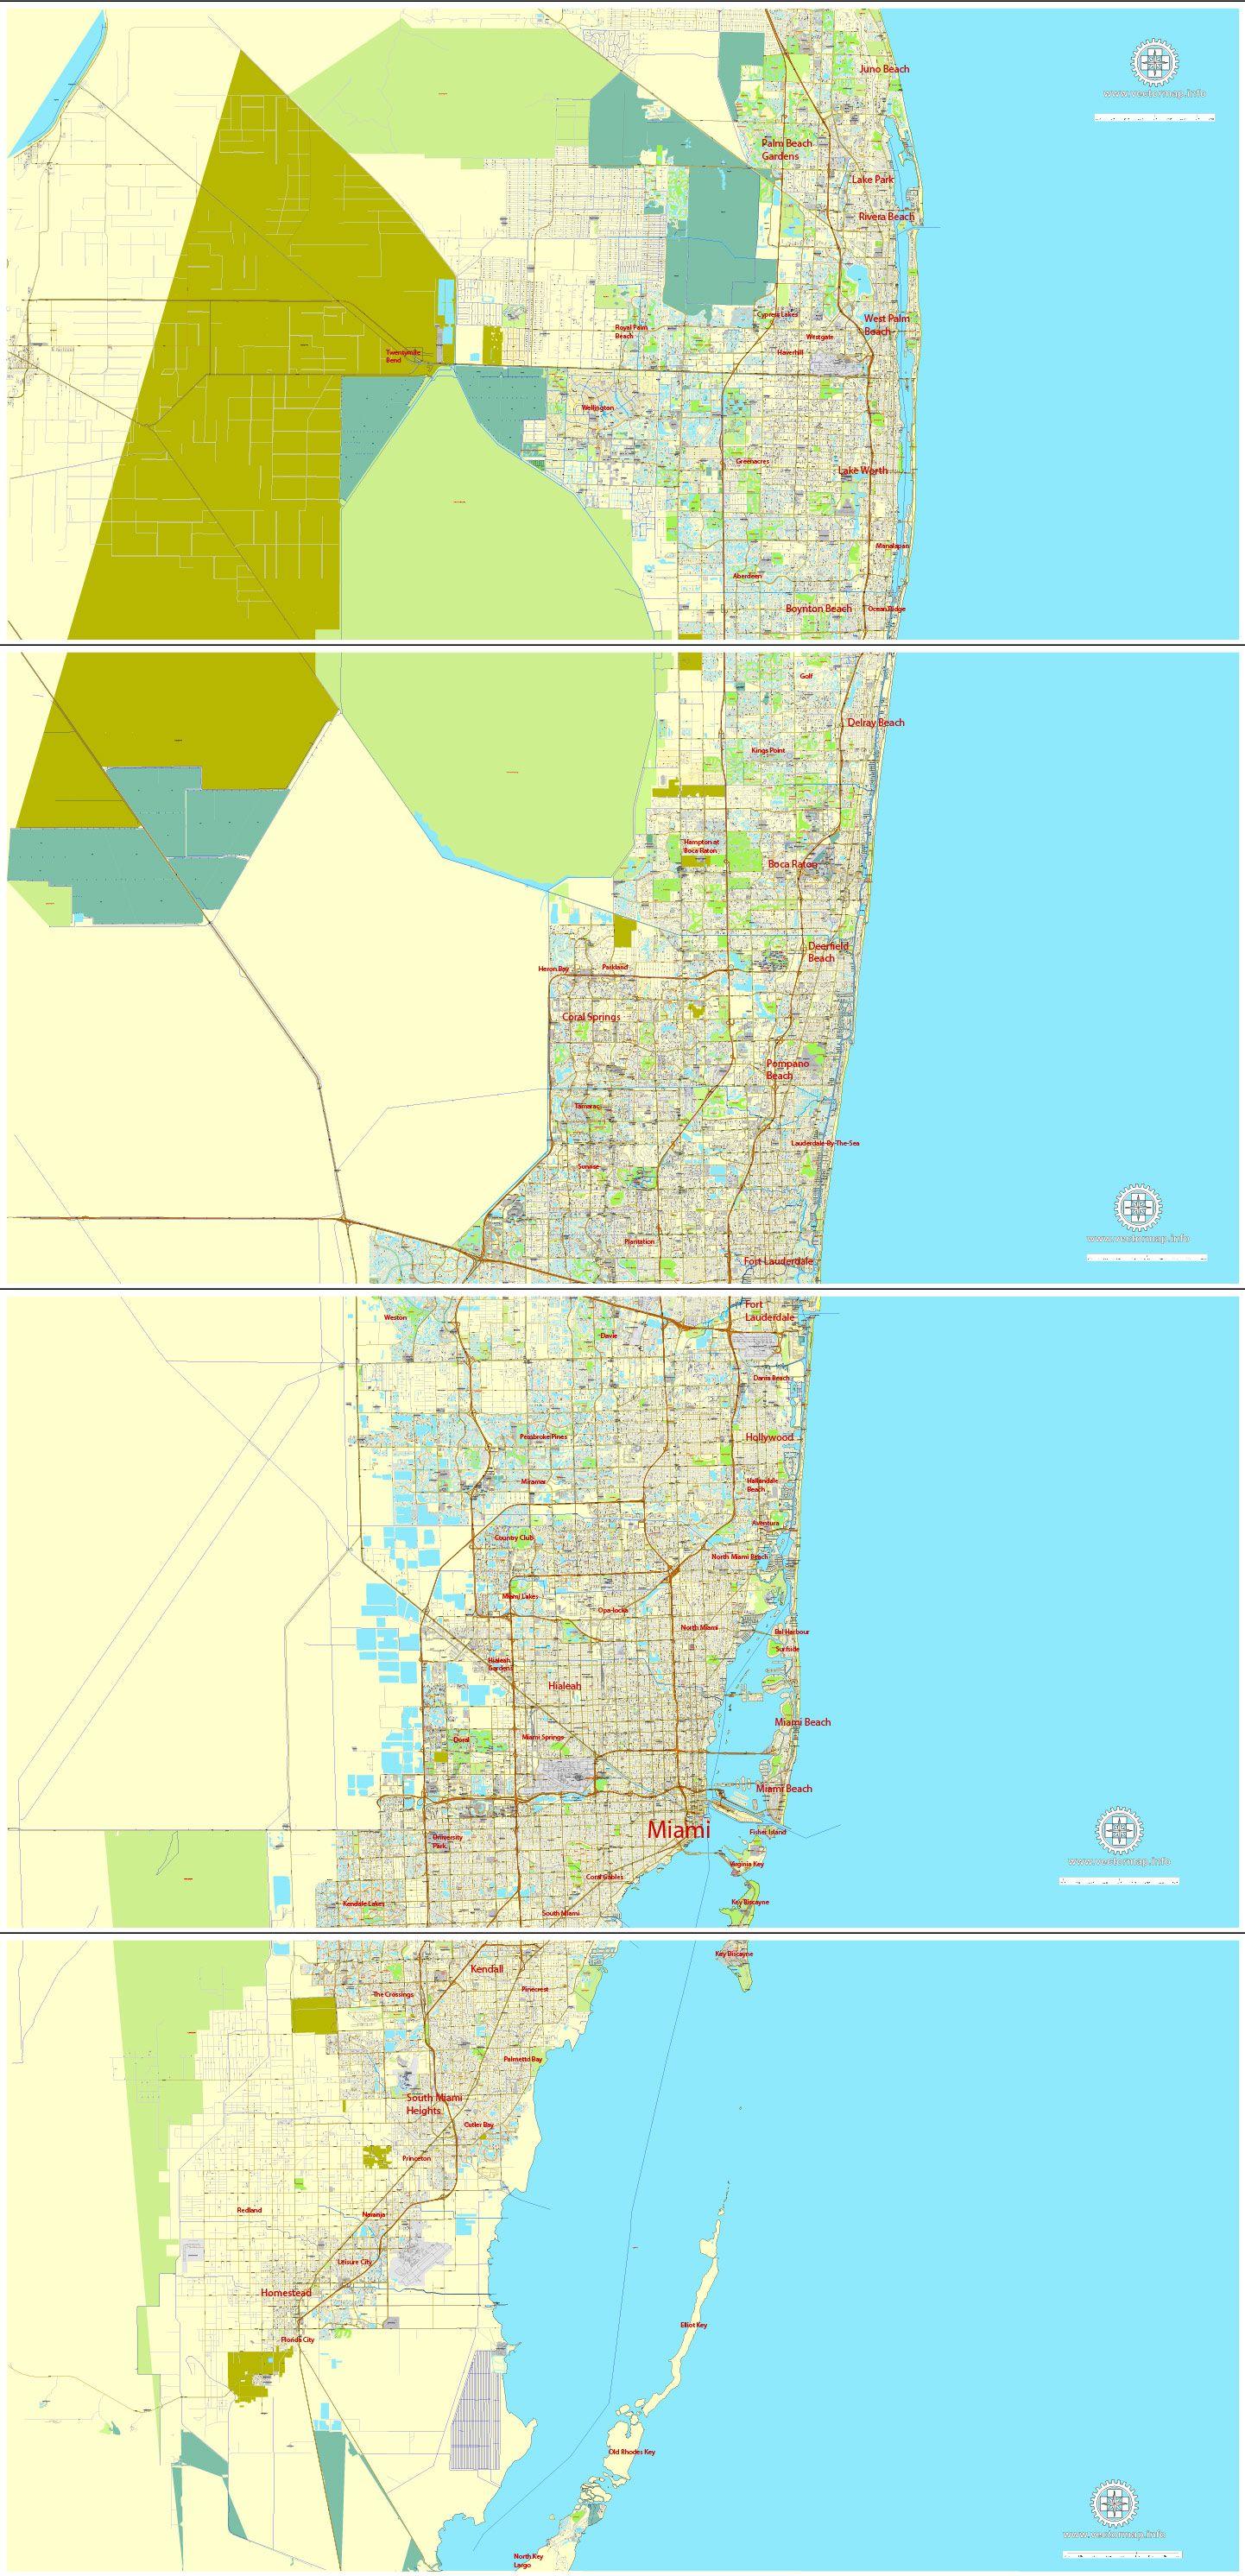 miami pdf map florida us exact vector city plan map in 4